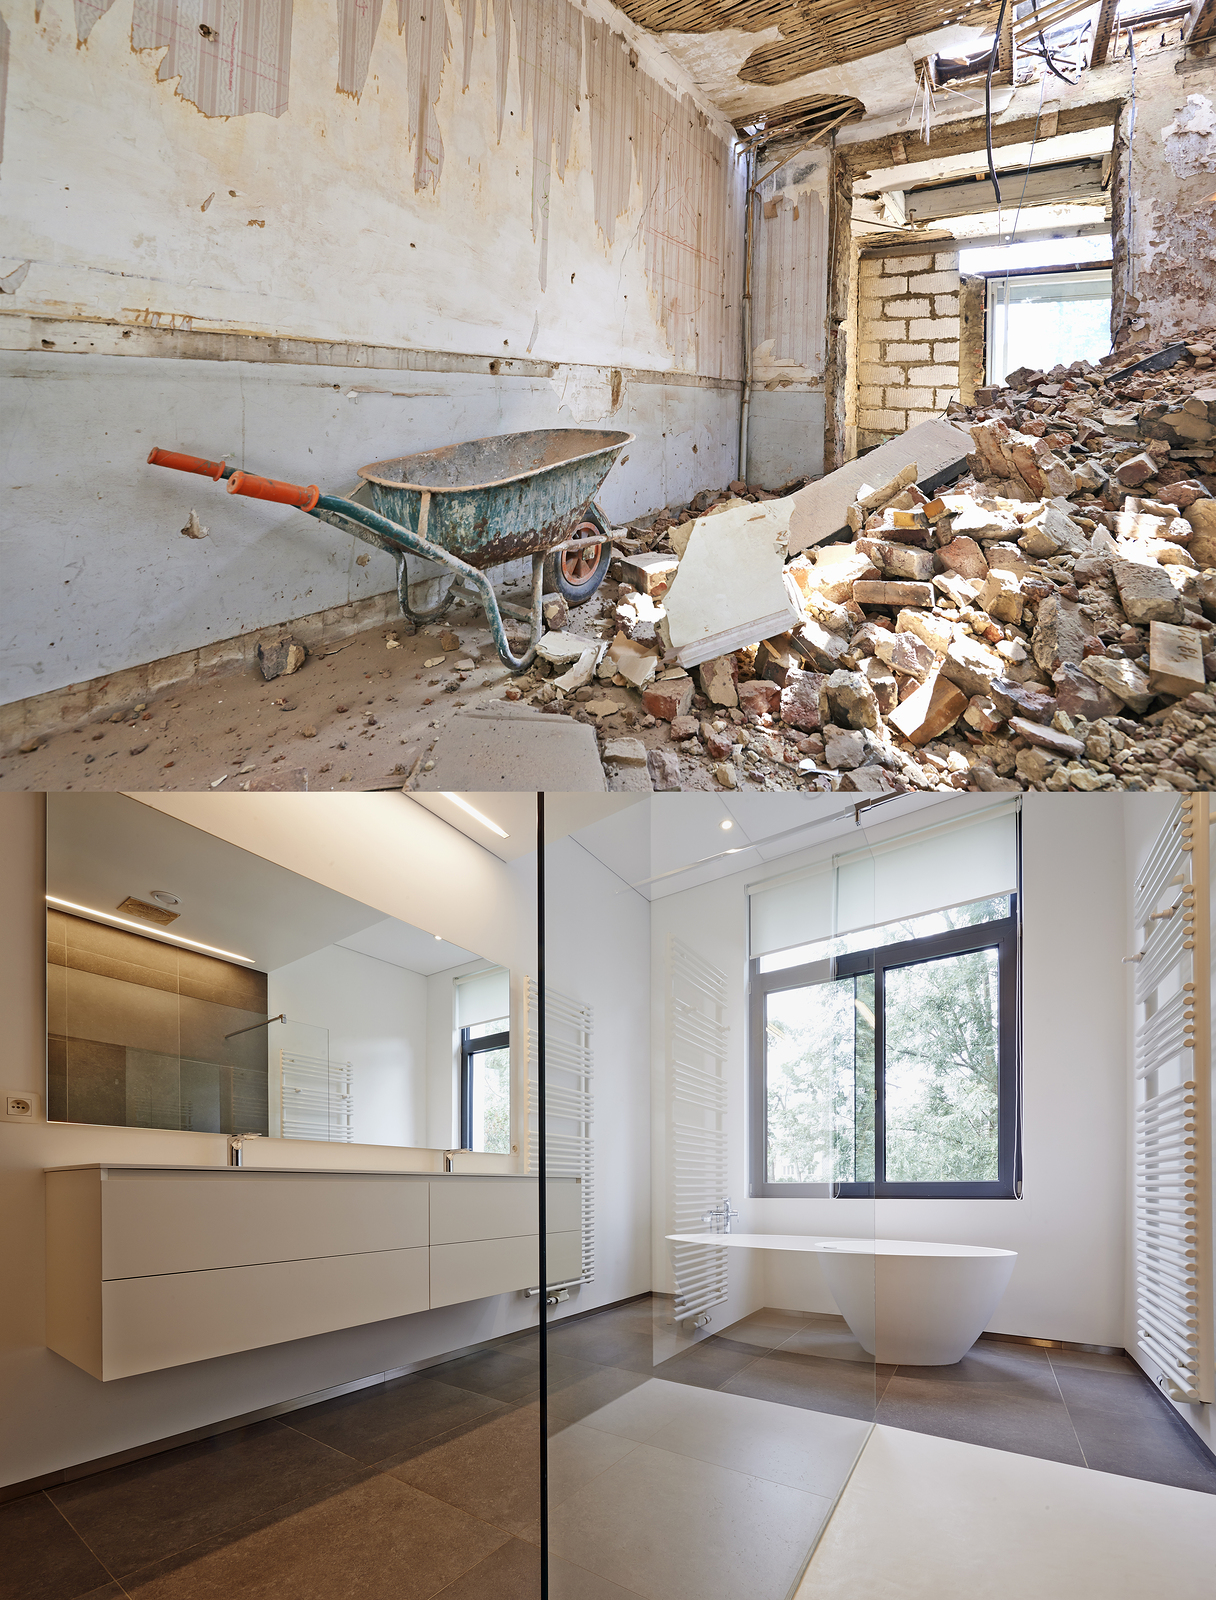 bigstock-Renovation-Of-A-Bathroom-Befor-118692716